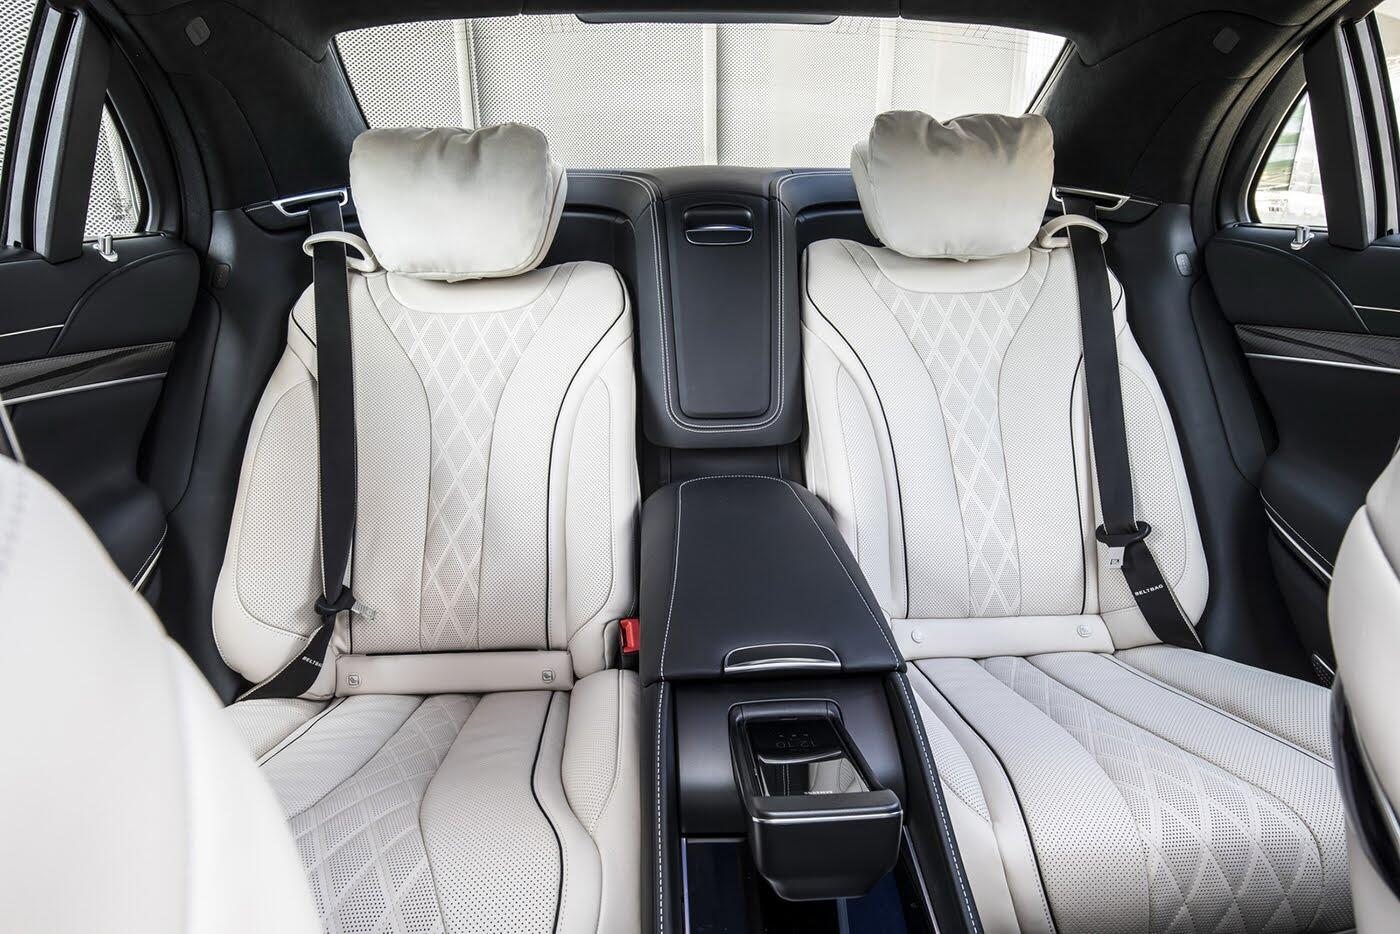 Ảnh chi tiết Mercedes-Benz S-Class 2018 - Hình 42